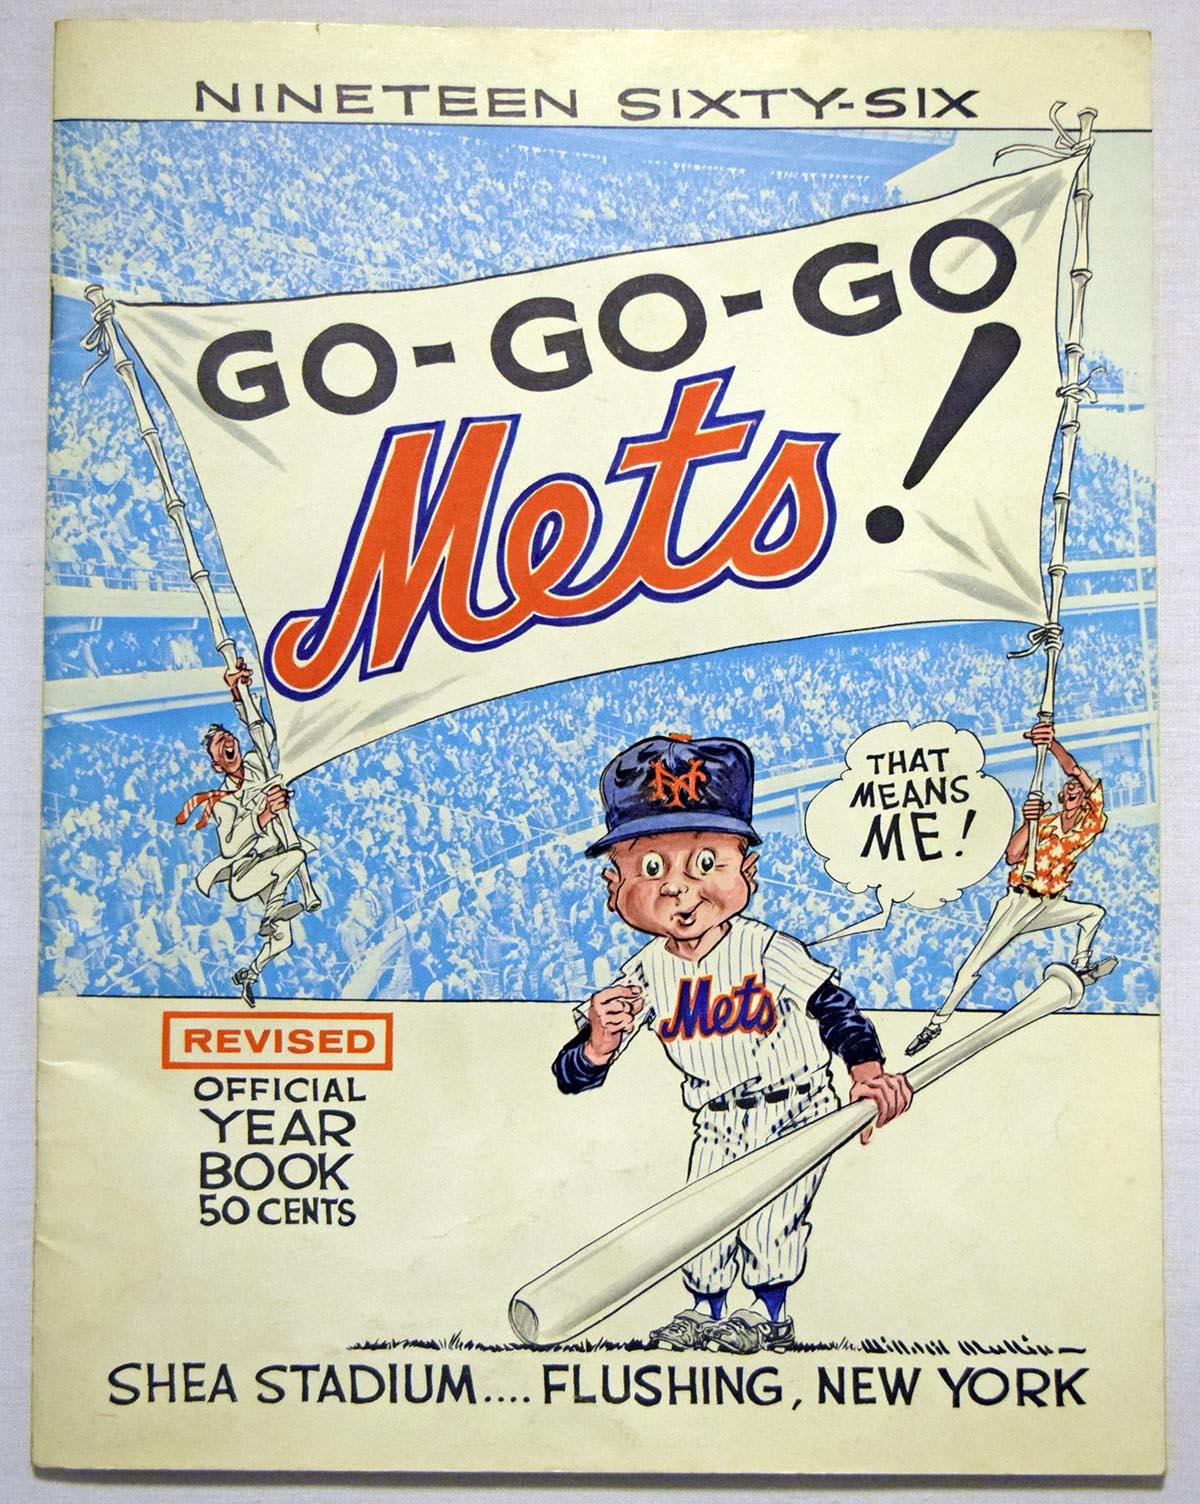 Lot #1198 1966 Yearbook  New York Mets (rev) Cond: VG-Ex/Ex